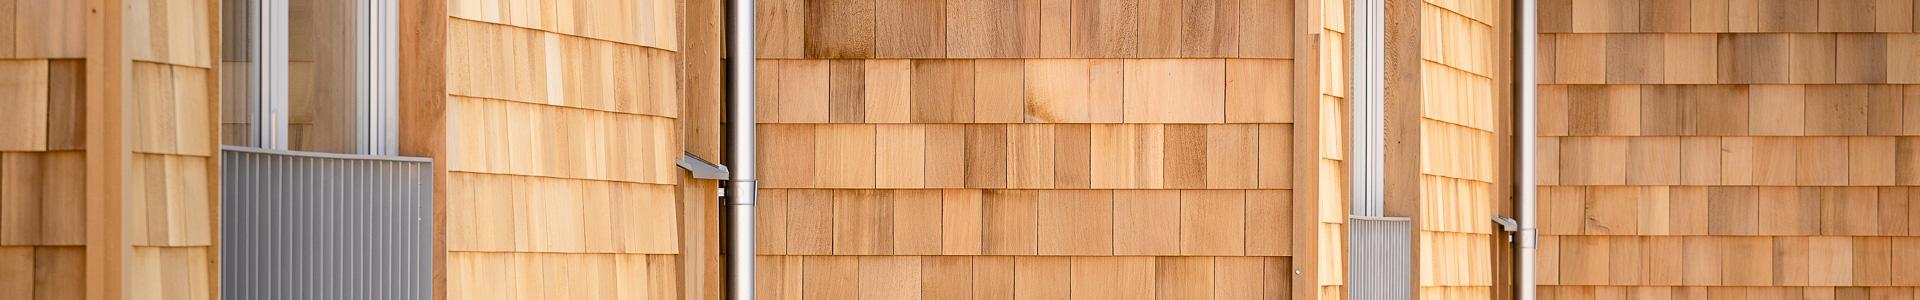 Cederspån, PEFC™, Kärnsund Wood Link